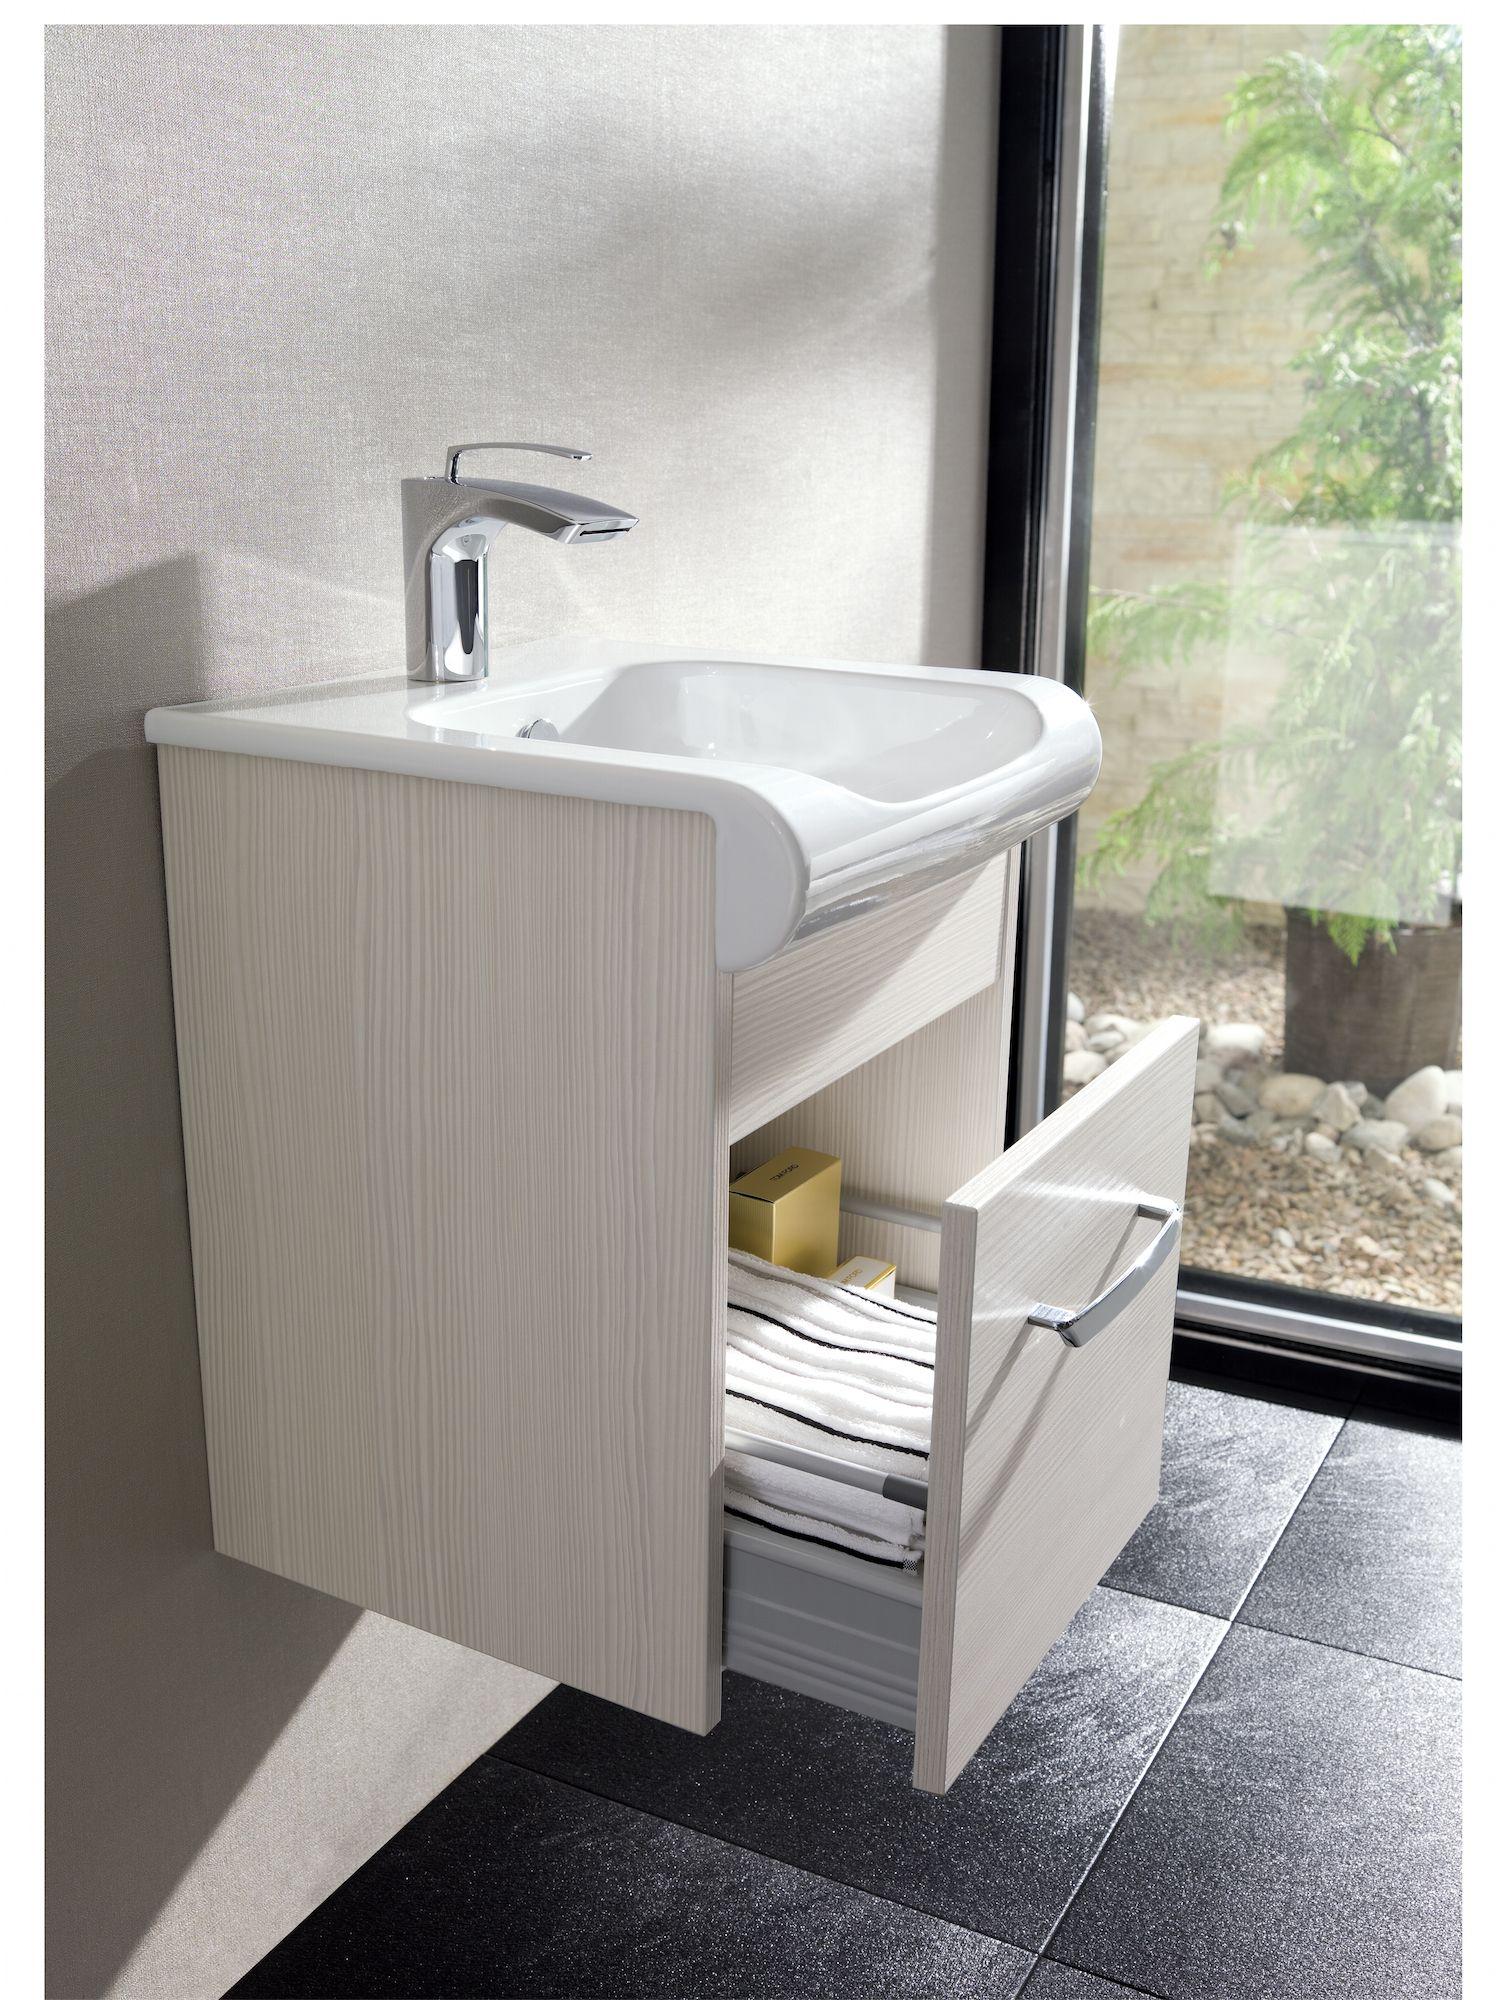 Bathroom units uk - Essence Glacier Bathroom Furniture Unit Basin From Crosswater Http Www Bauhaus